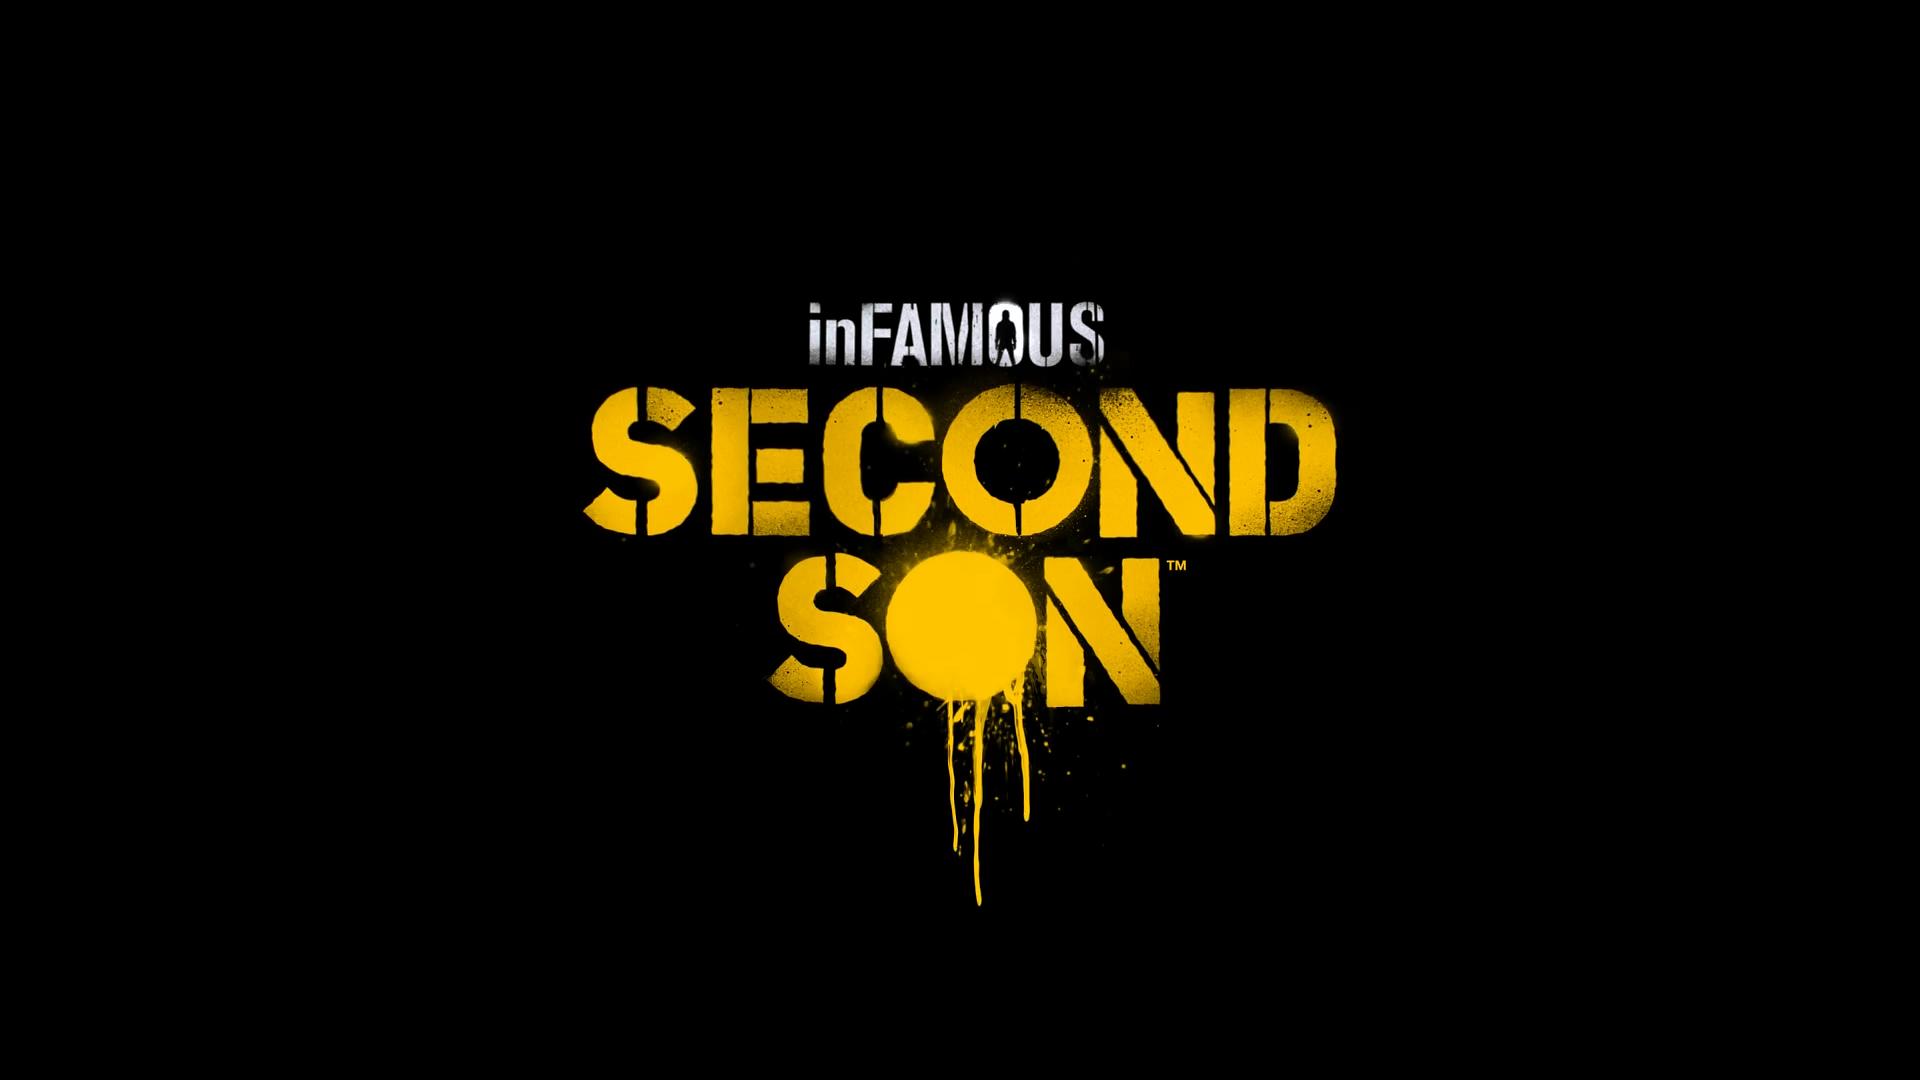 inFAMOUS Second Son - inFAMOUS Second Son logo by Legan666